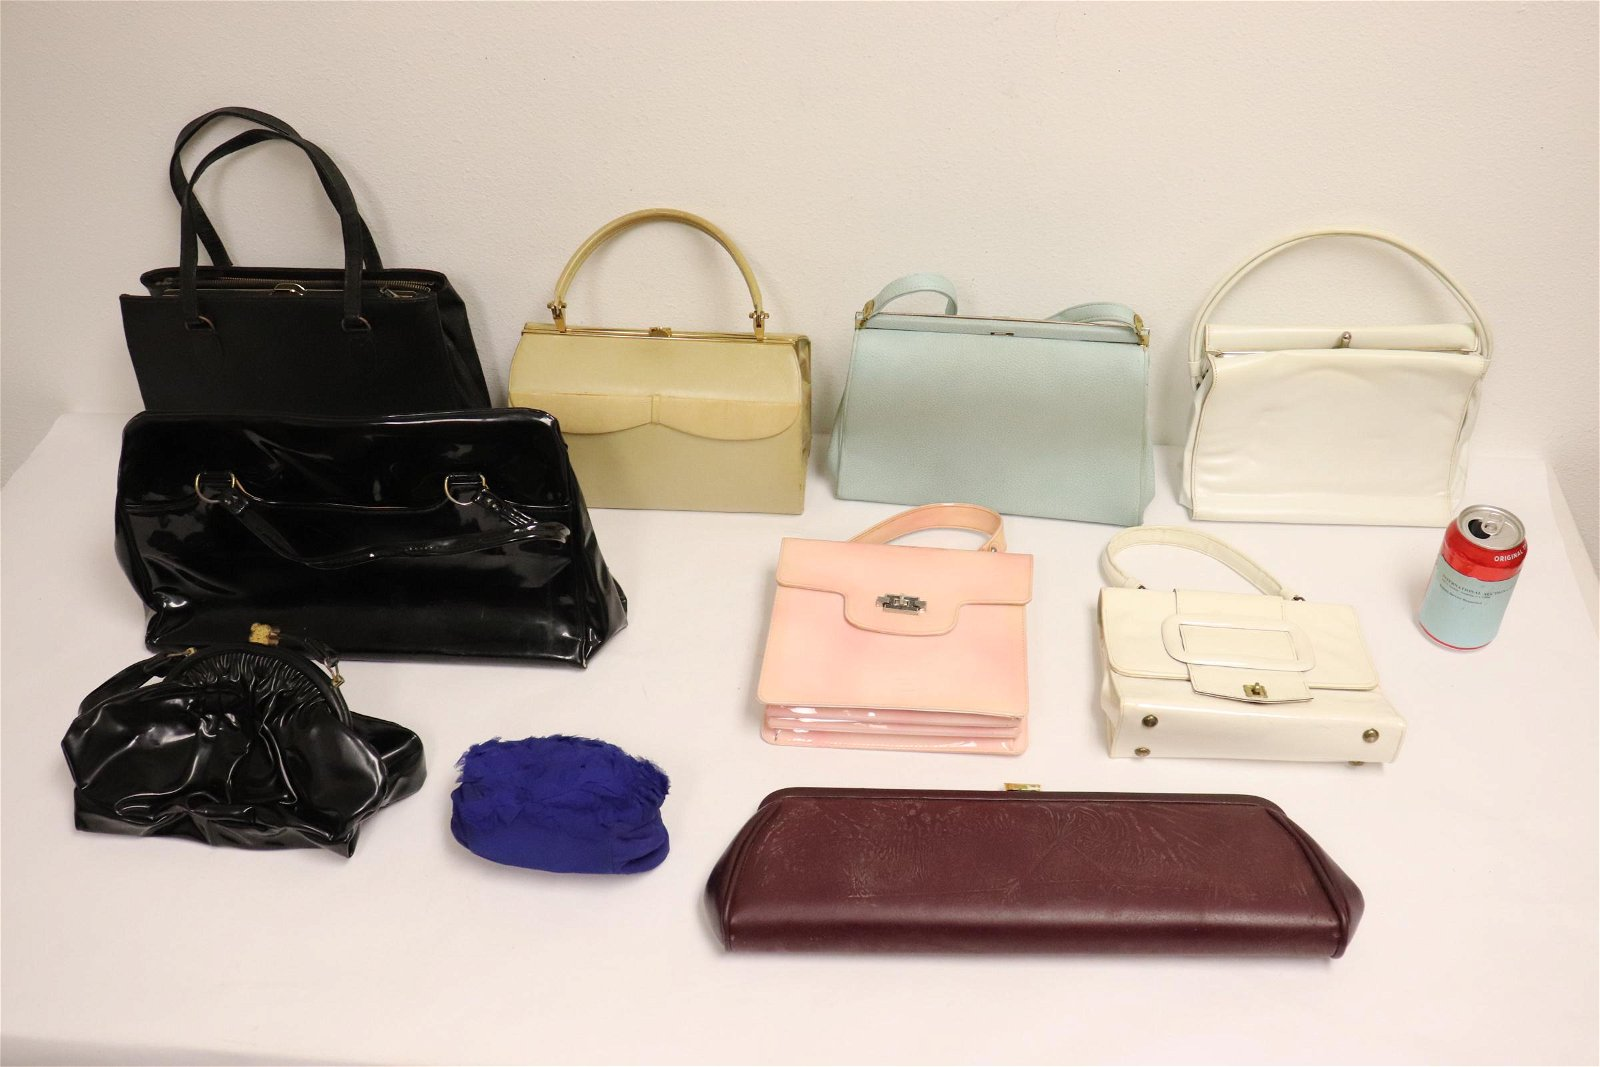 10 vintage handbags